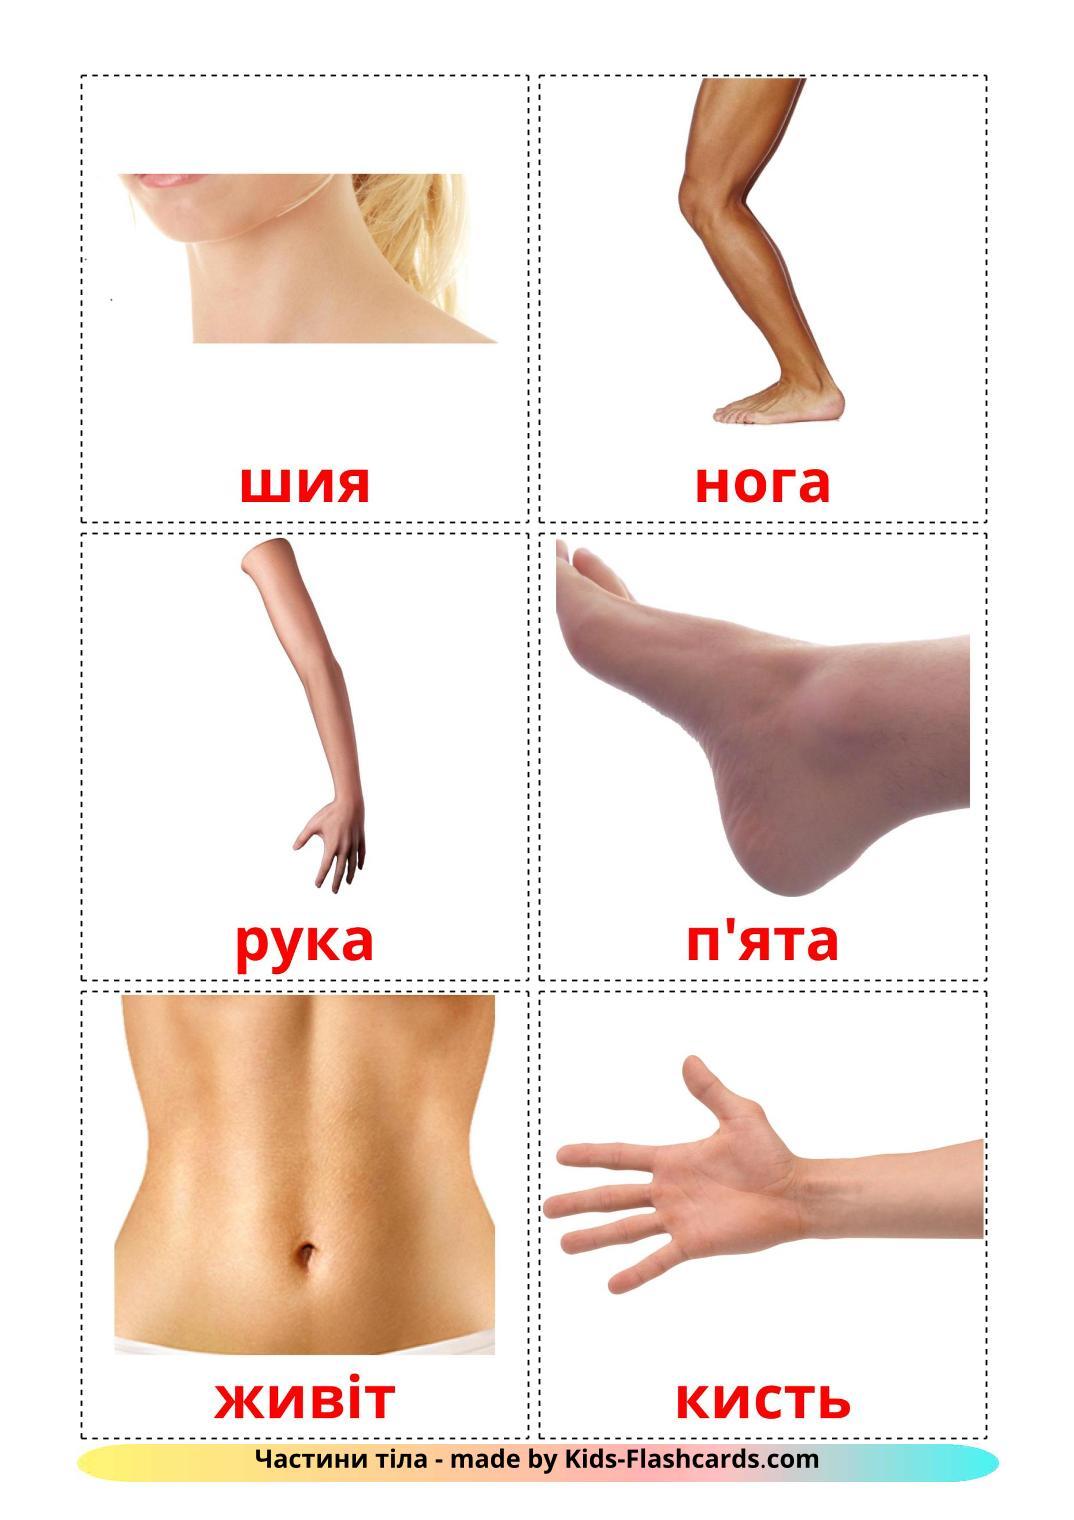 Body Parts - 26 Free Printable ukrainian Flashcards